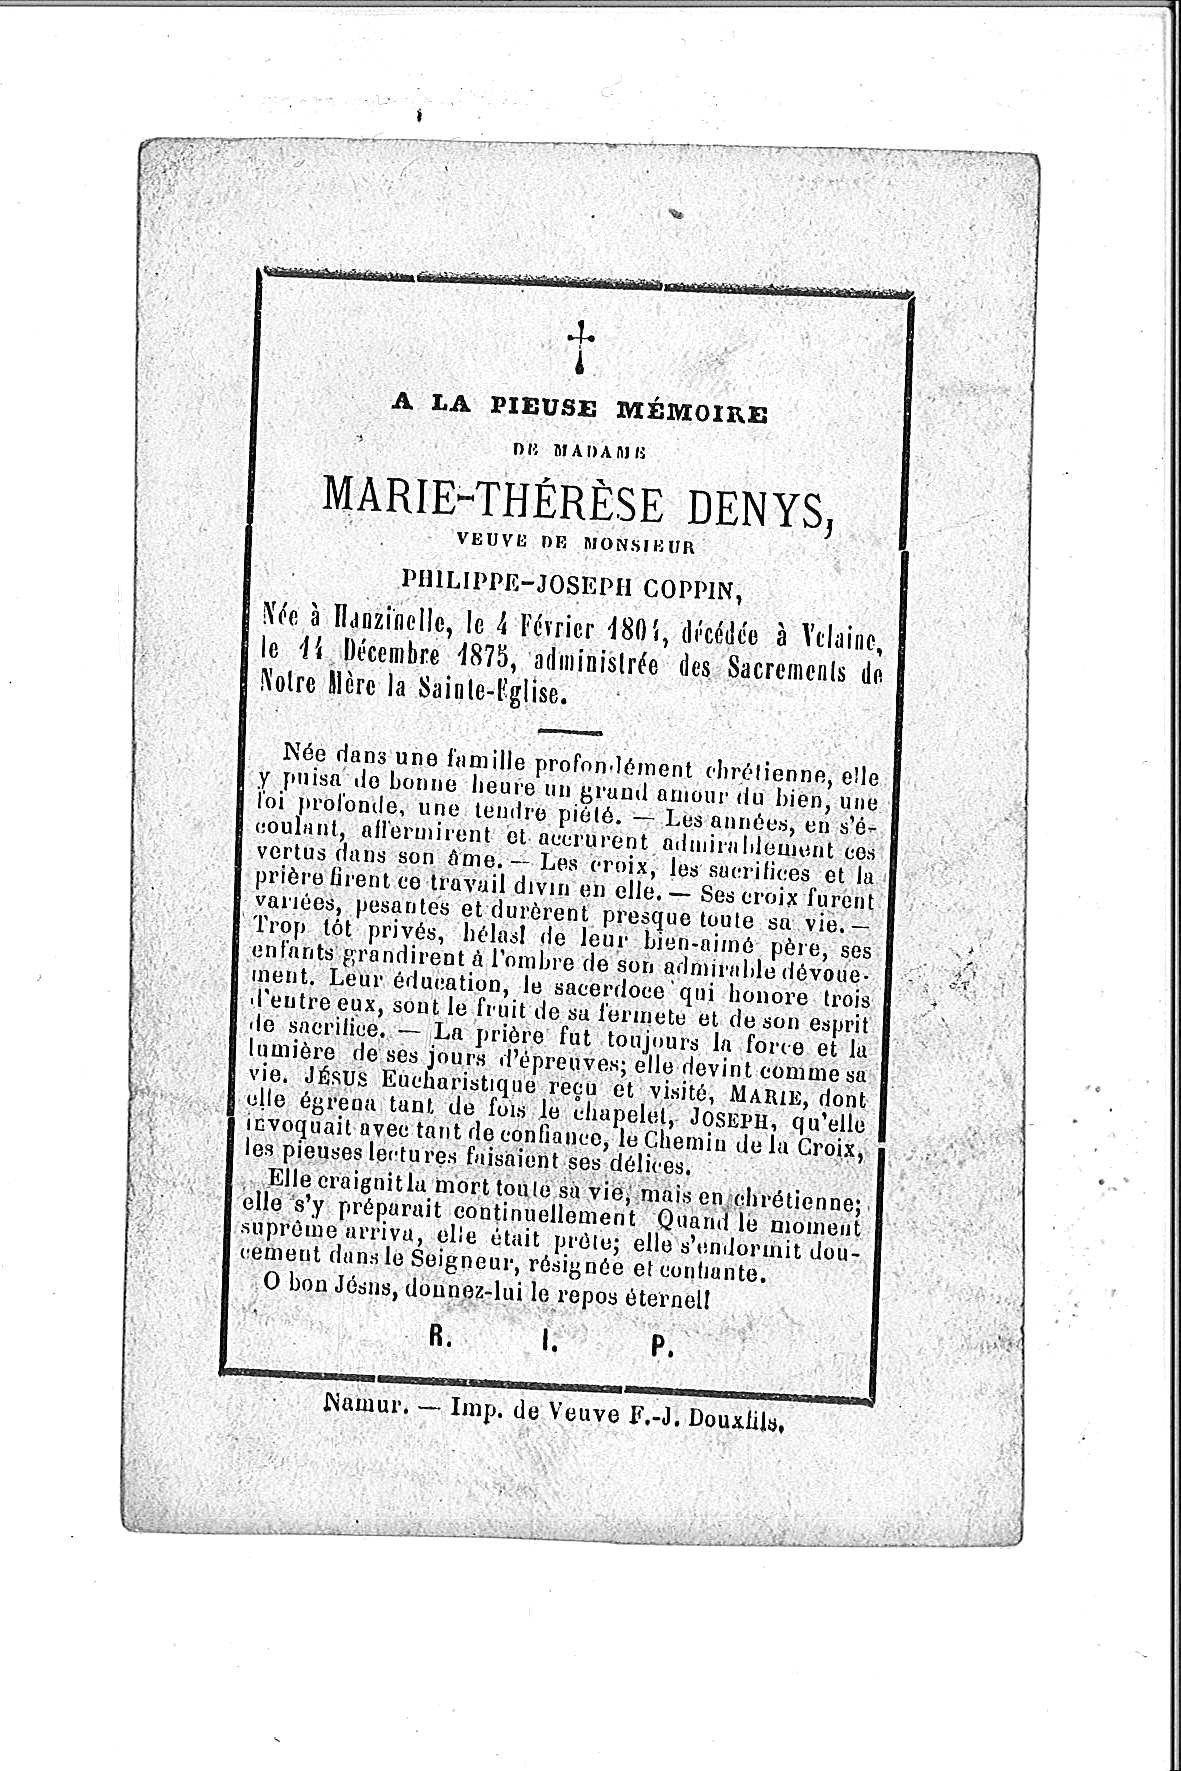 Marie-Therese(1875)20150415104000_00067.jpg